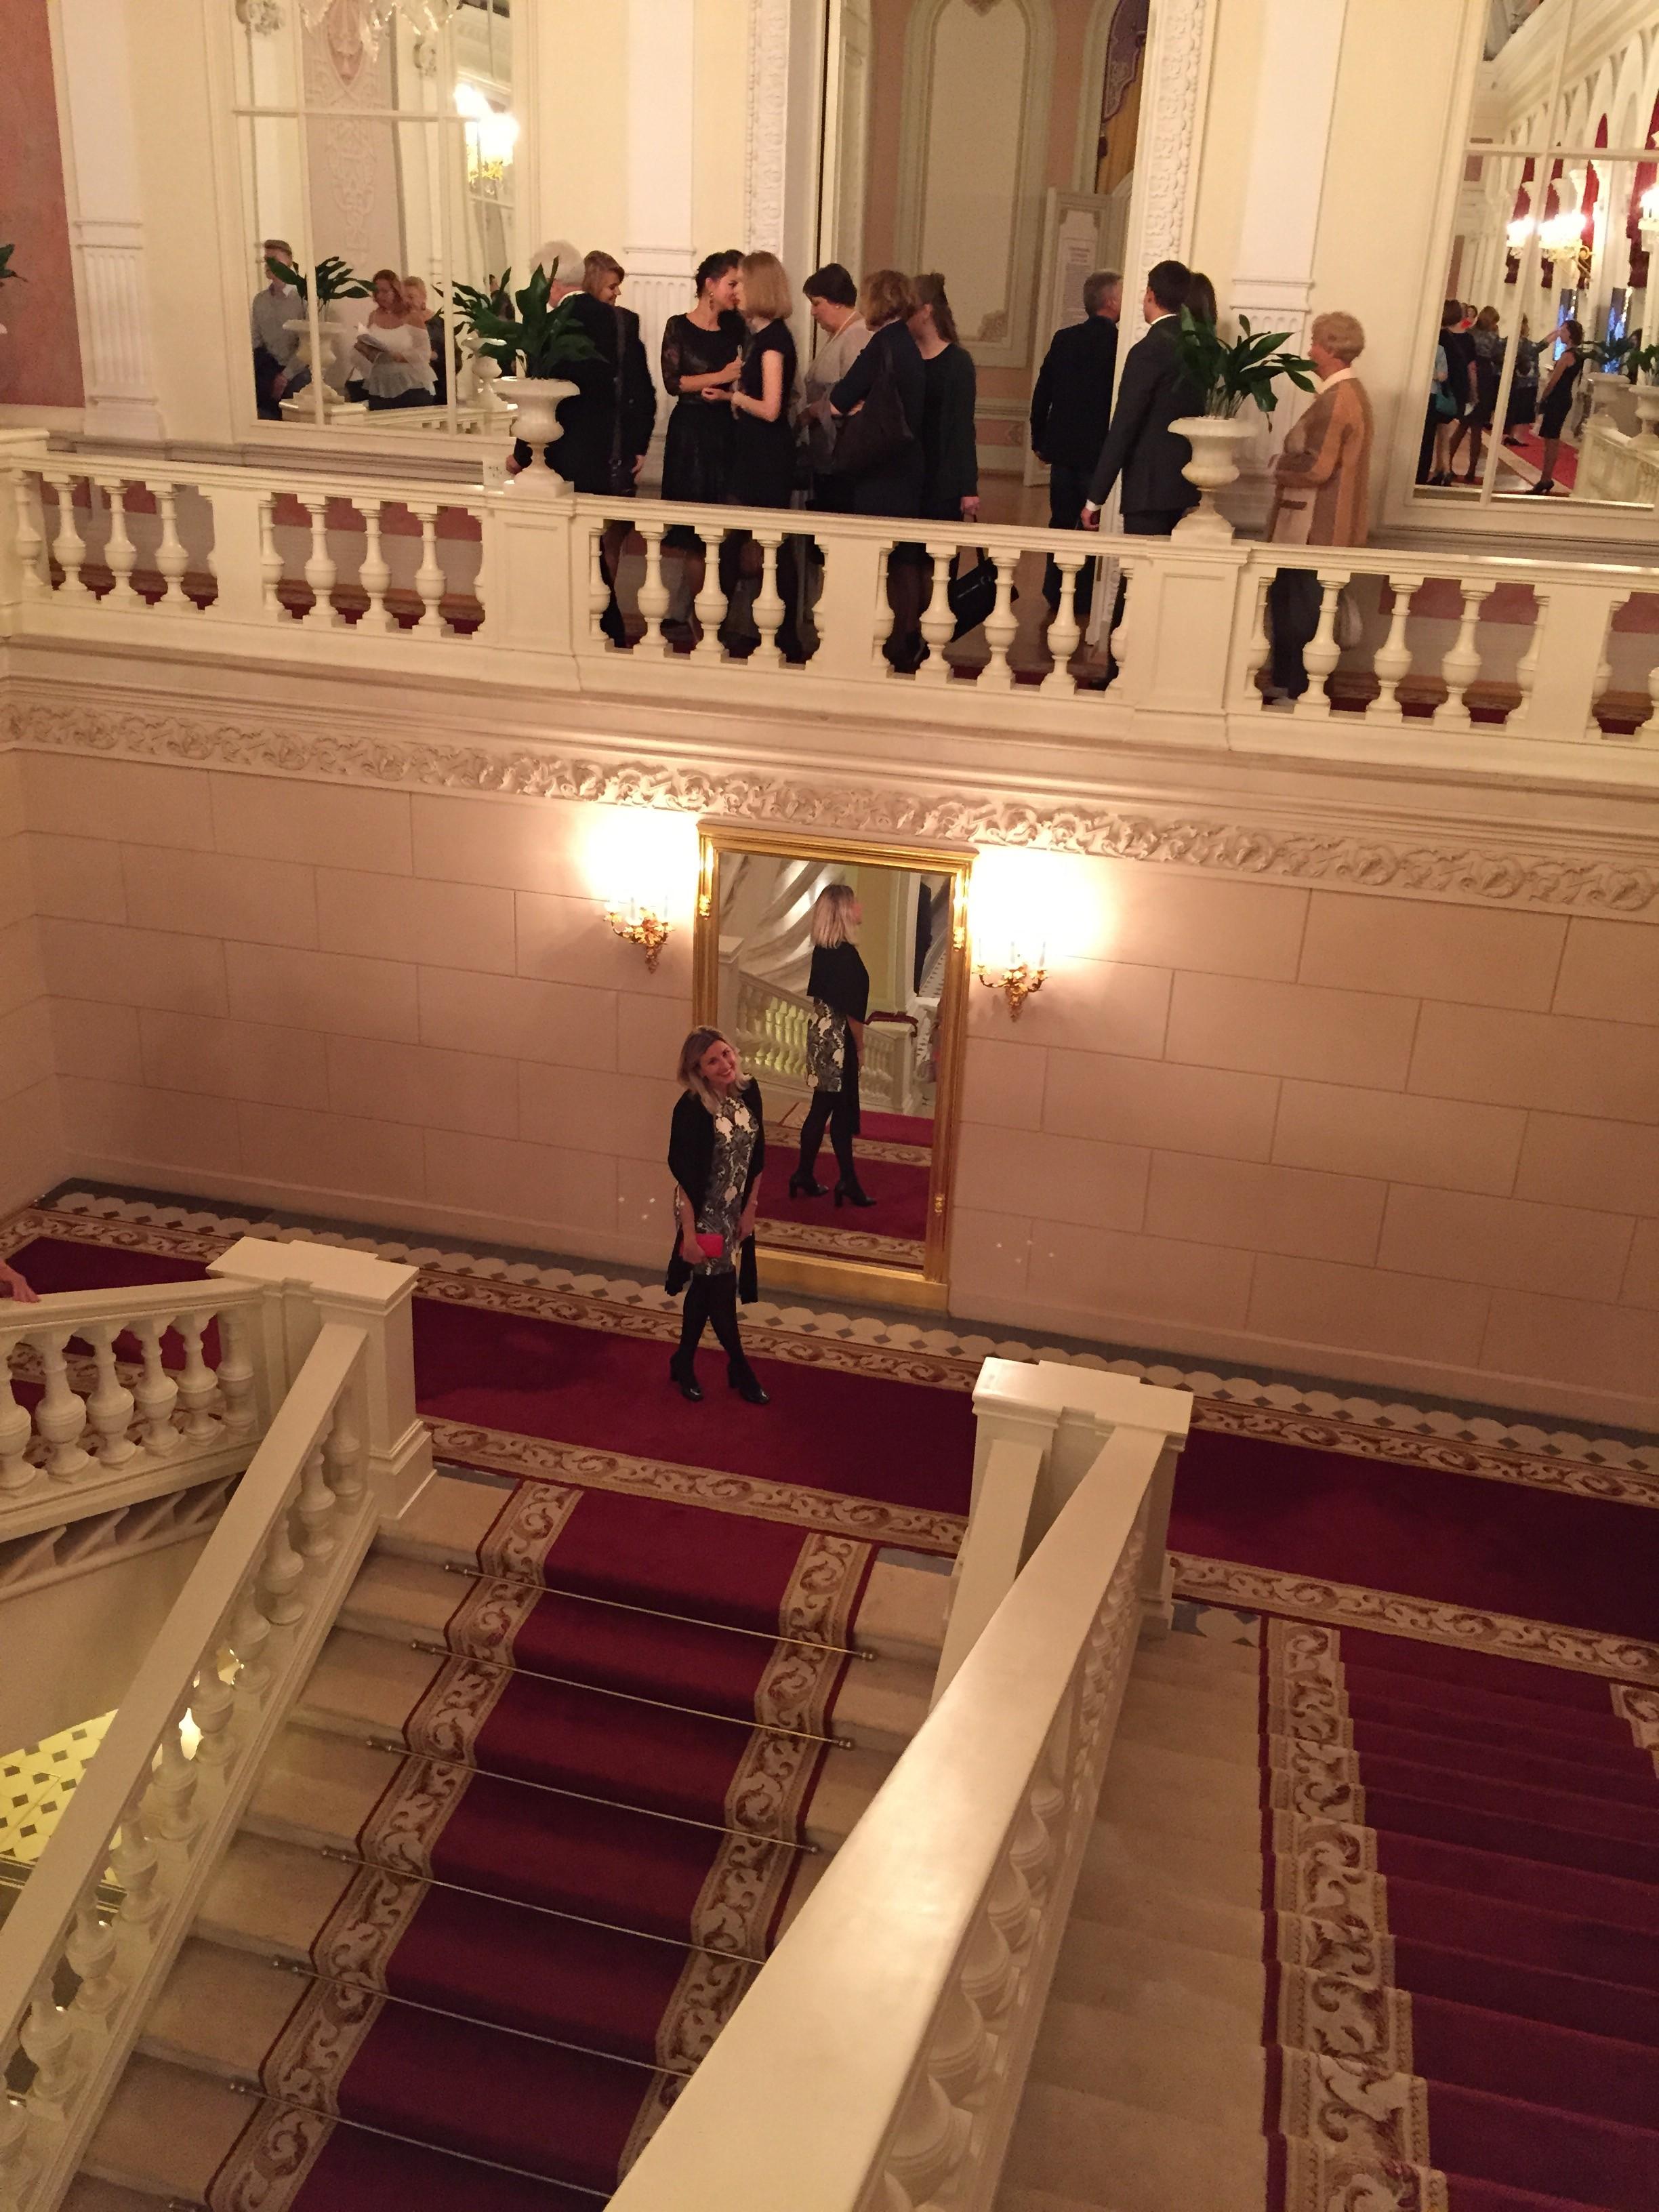 teatro bolshoi moscou ballet lago dos cisnes